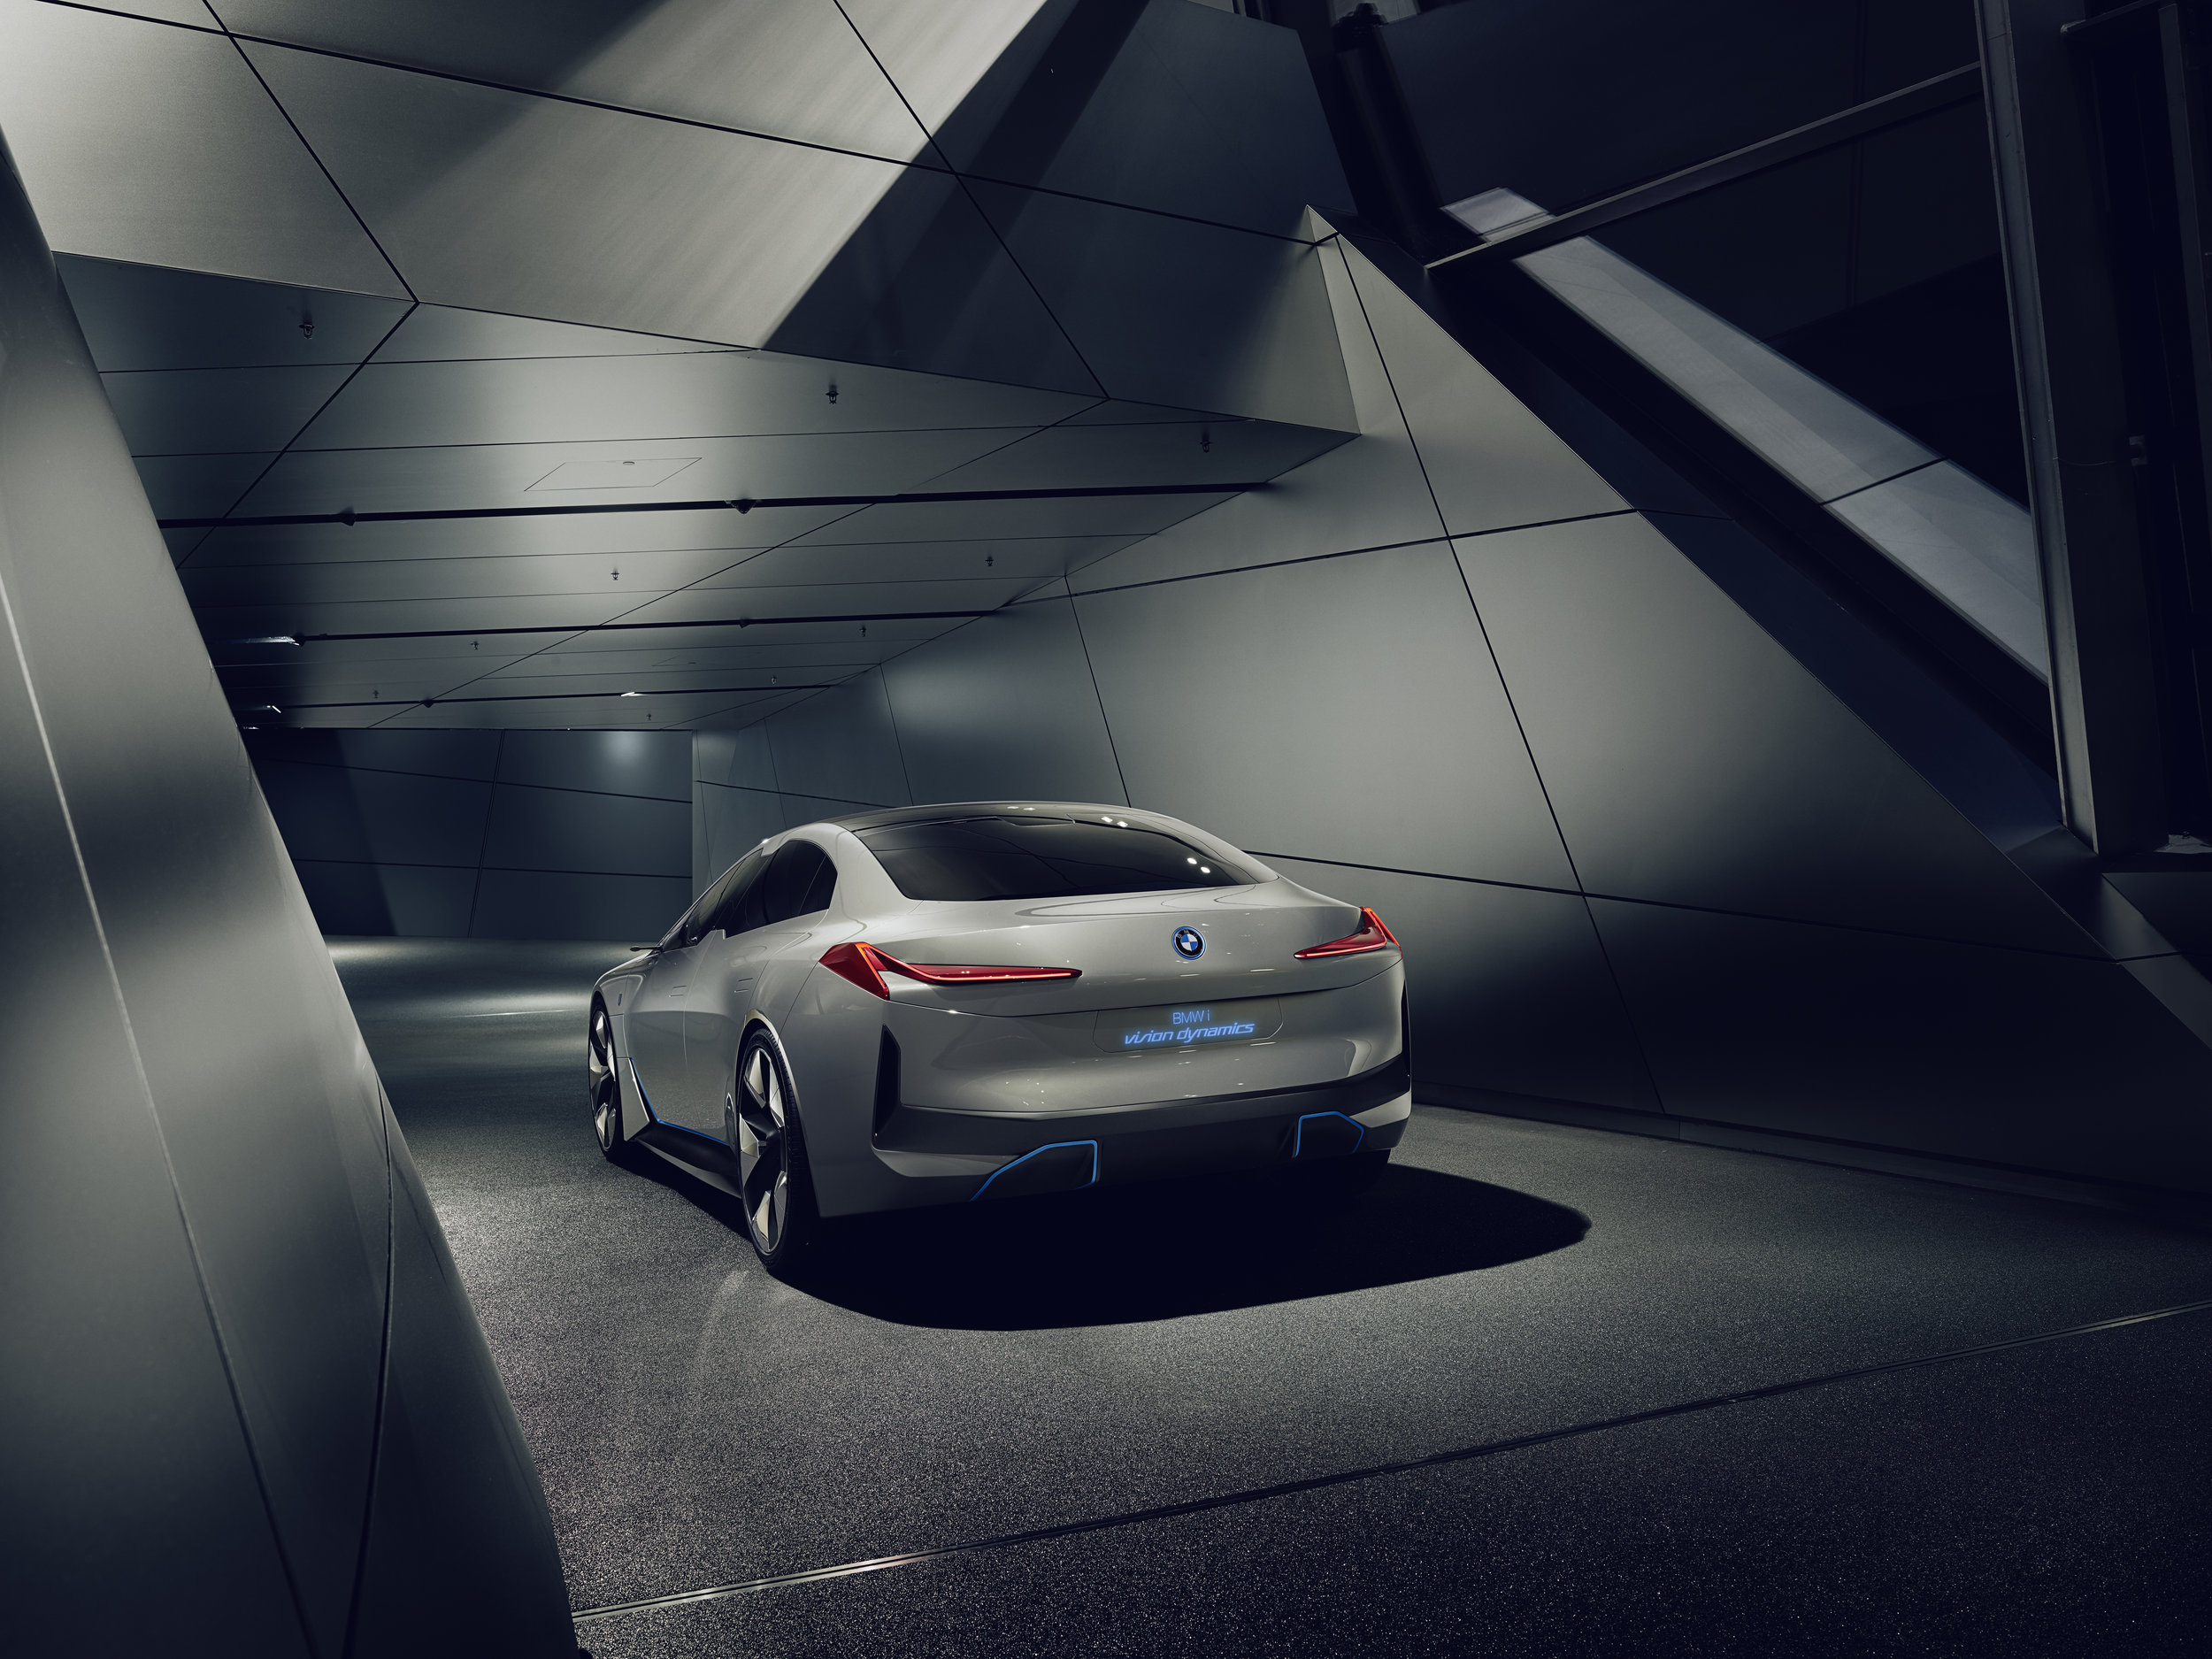 BMW_i_Vision_Dynamics_Real_V2_003.jpg